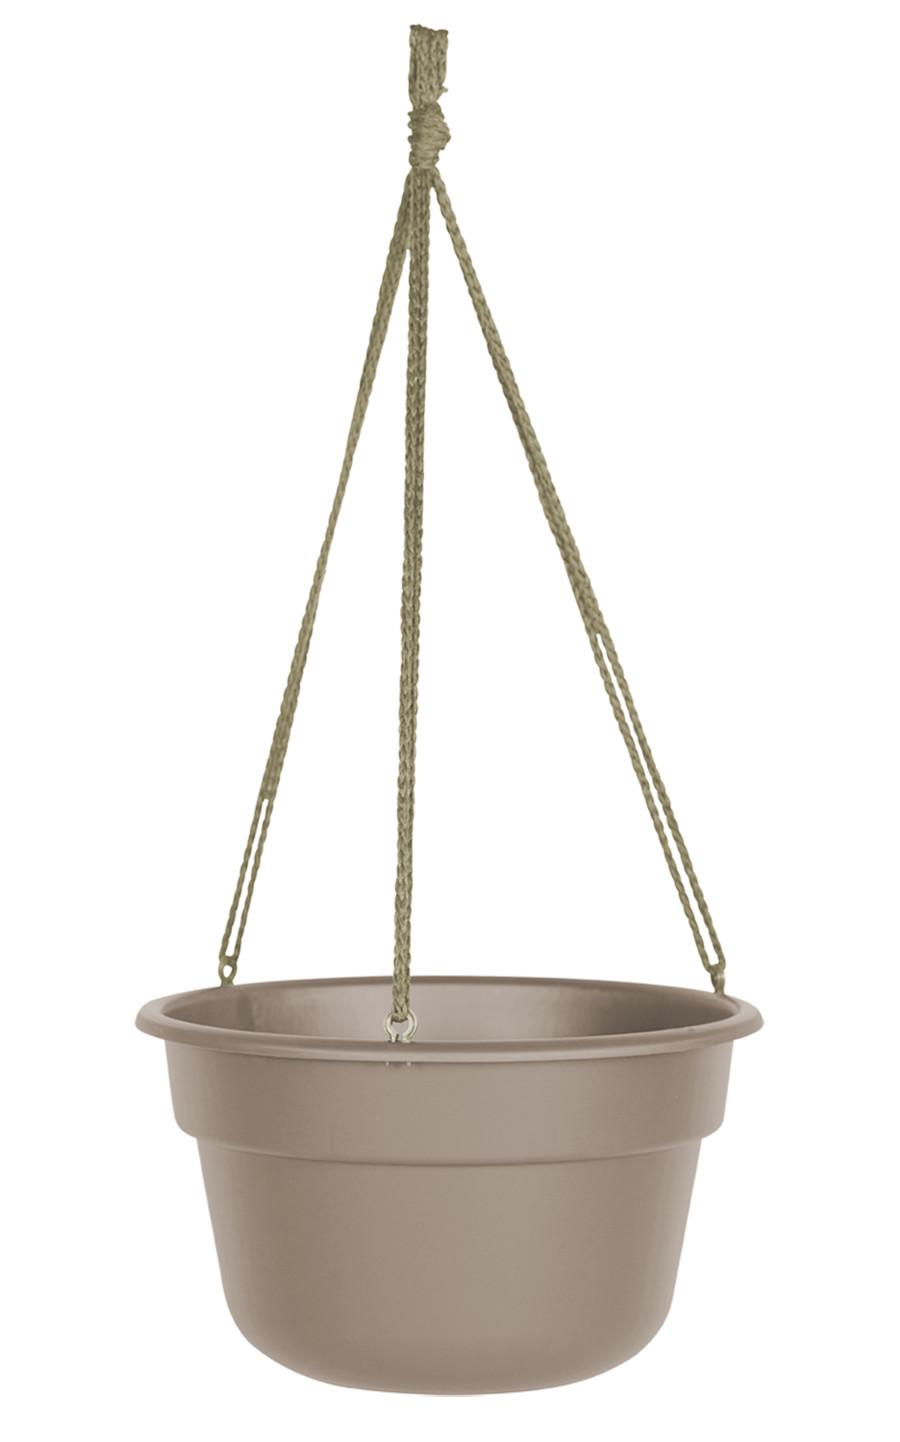 Bloem Dura Cotta Hanging Basket Planter Pebble Stone 12ea/12 in